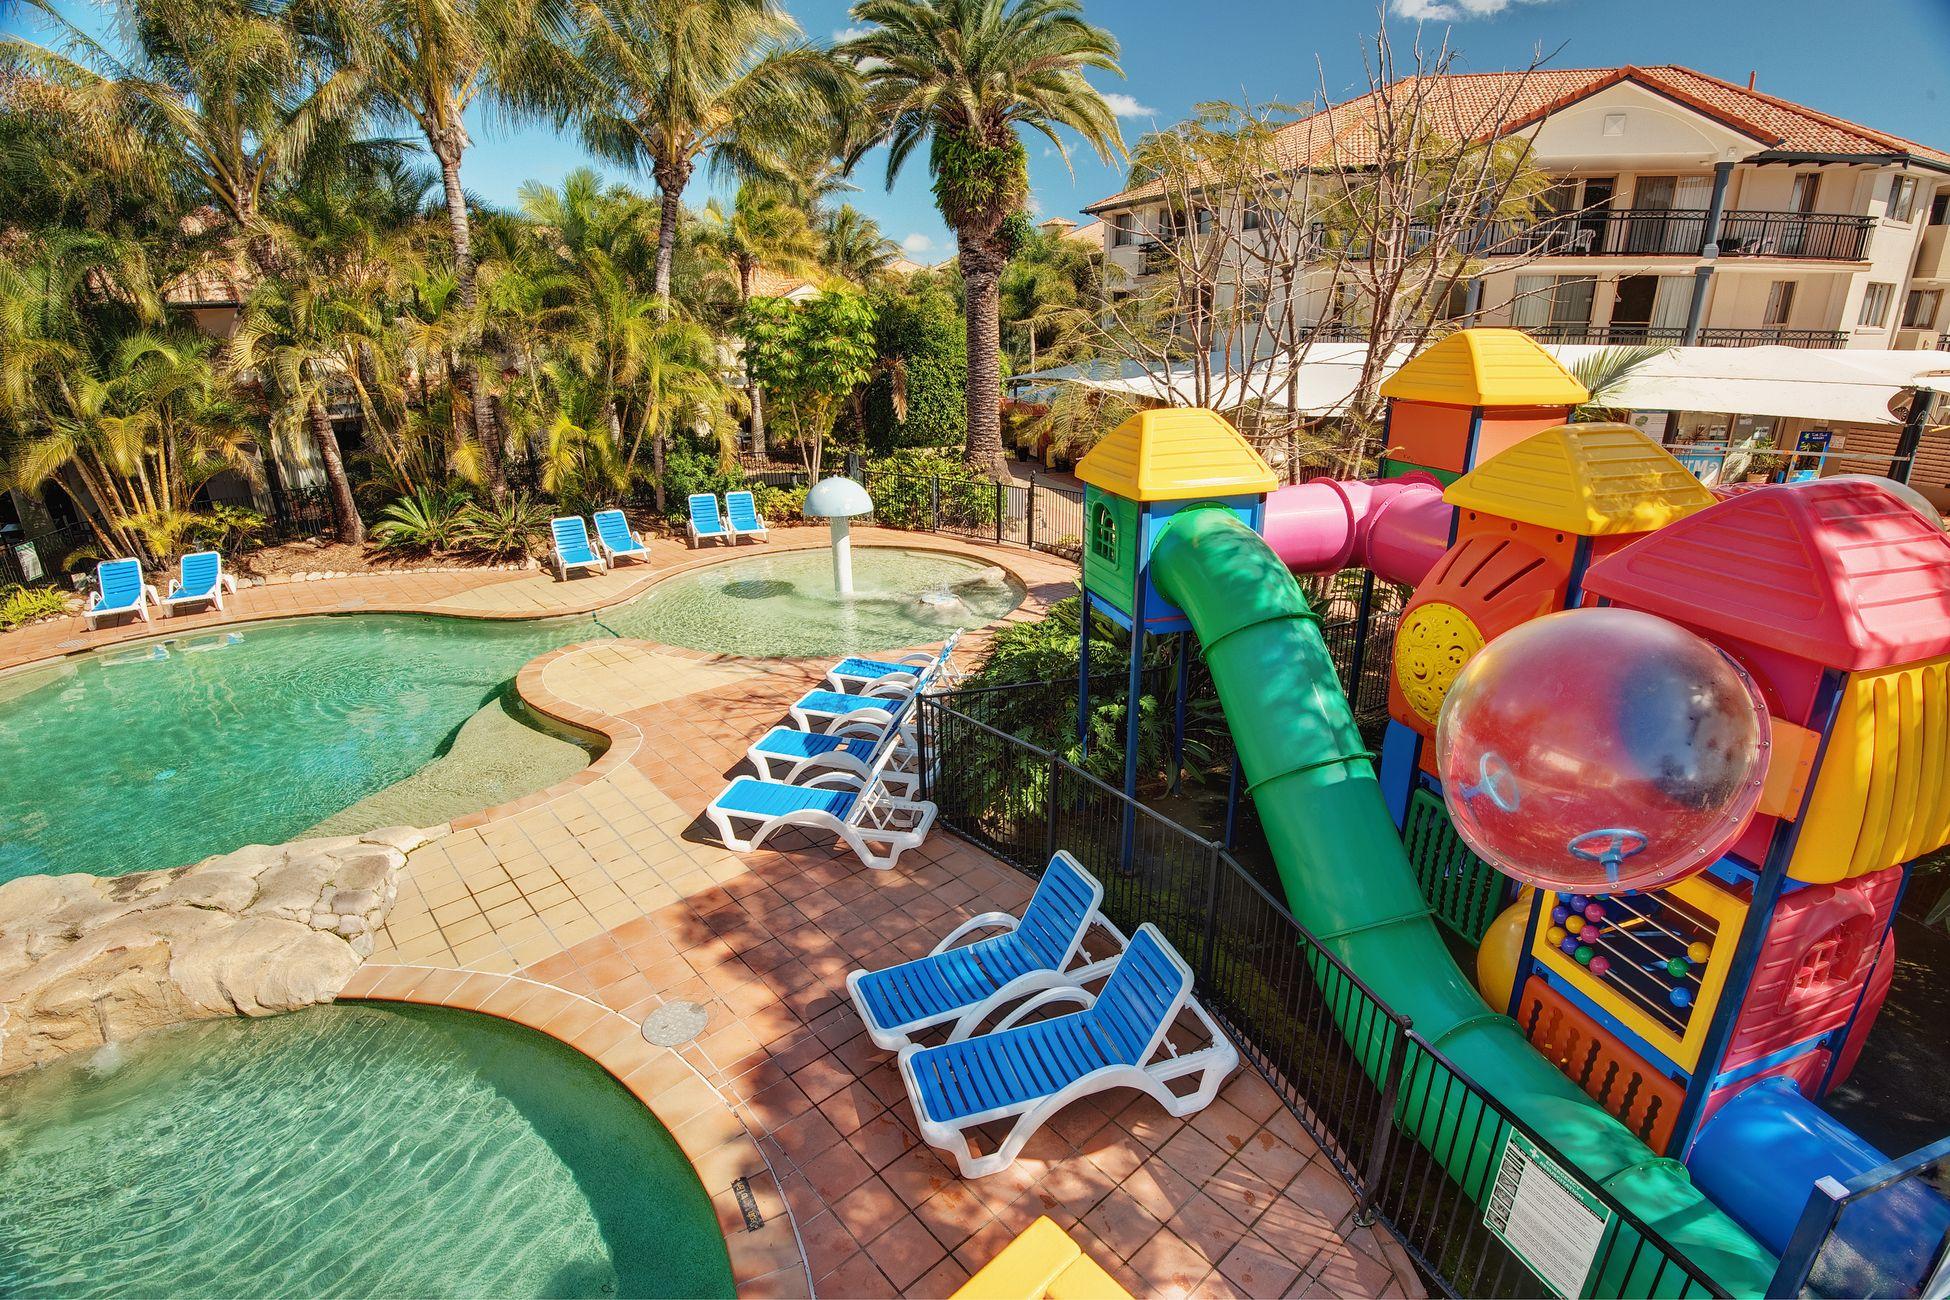 Resort Turtle Beach Resort, Mermaid Beach - trivago com au